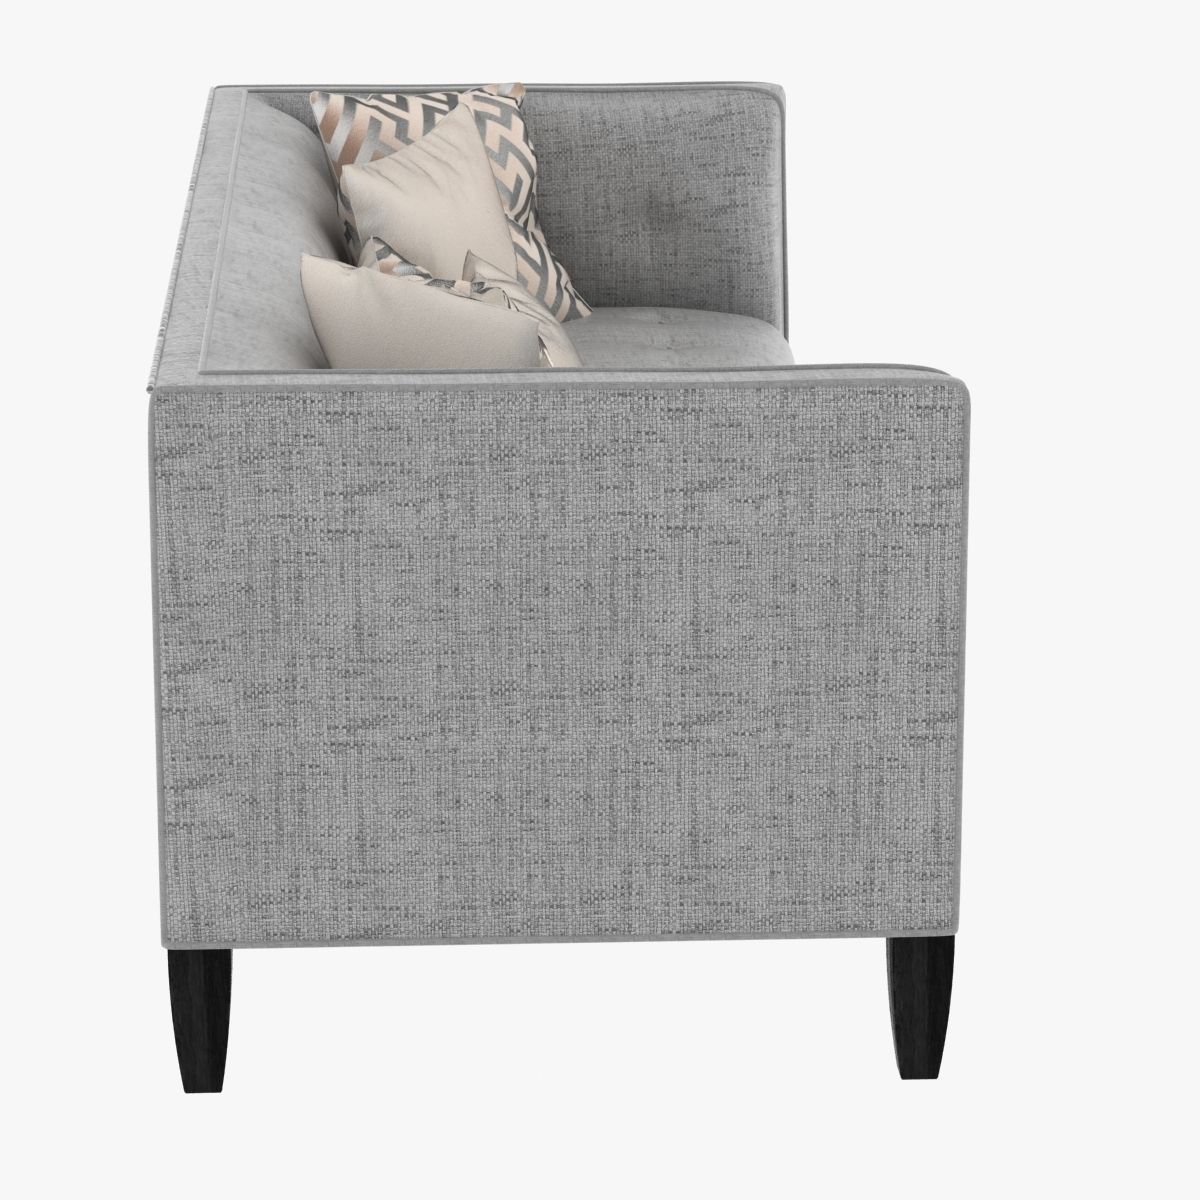 mitc gold and bob williams sofa baby chair dubai mitchell kennedy 3d model max obj